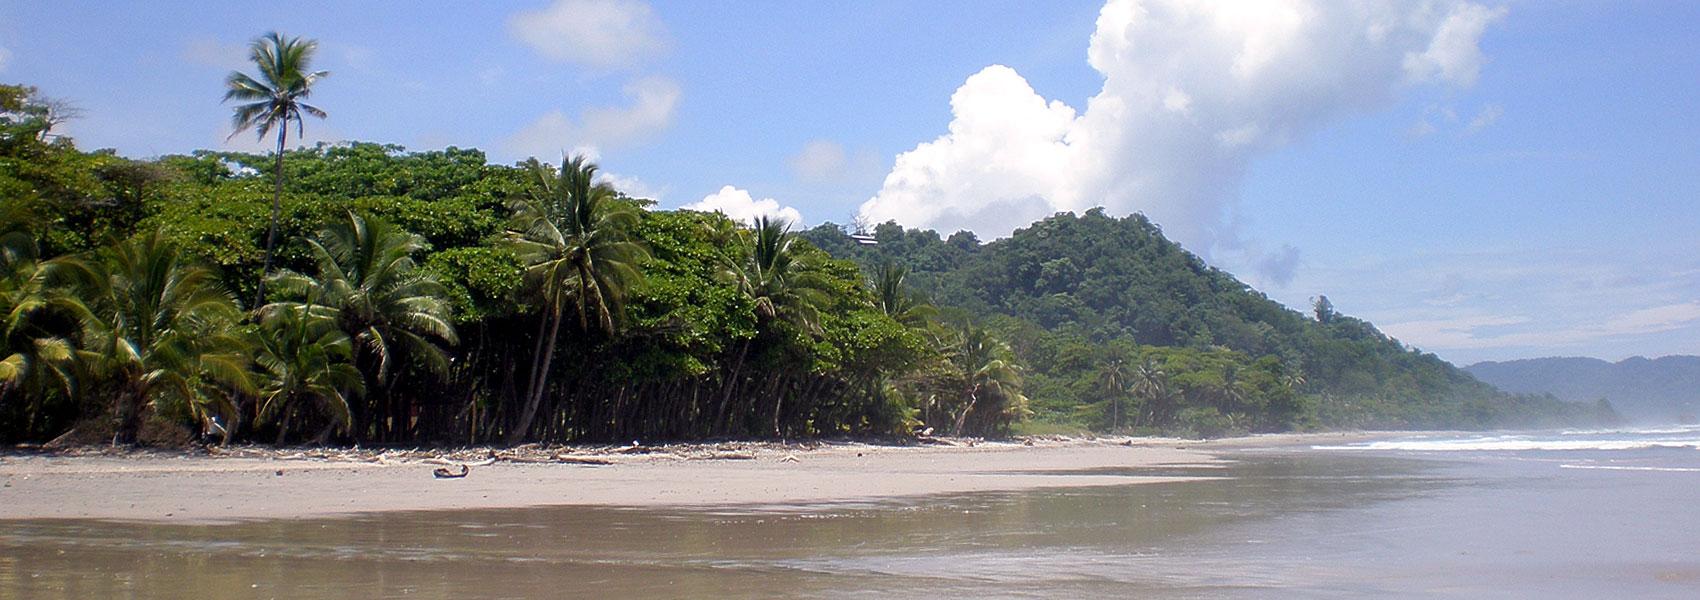 The gorgeous beaches of Santa Teresa are famous for their epic waves.